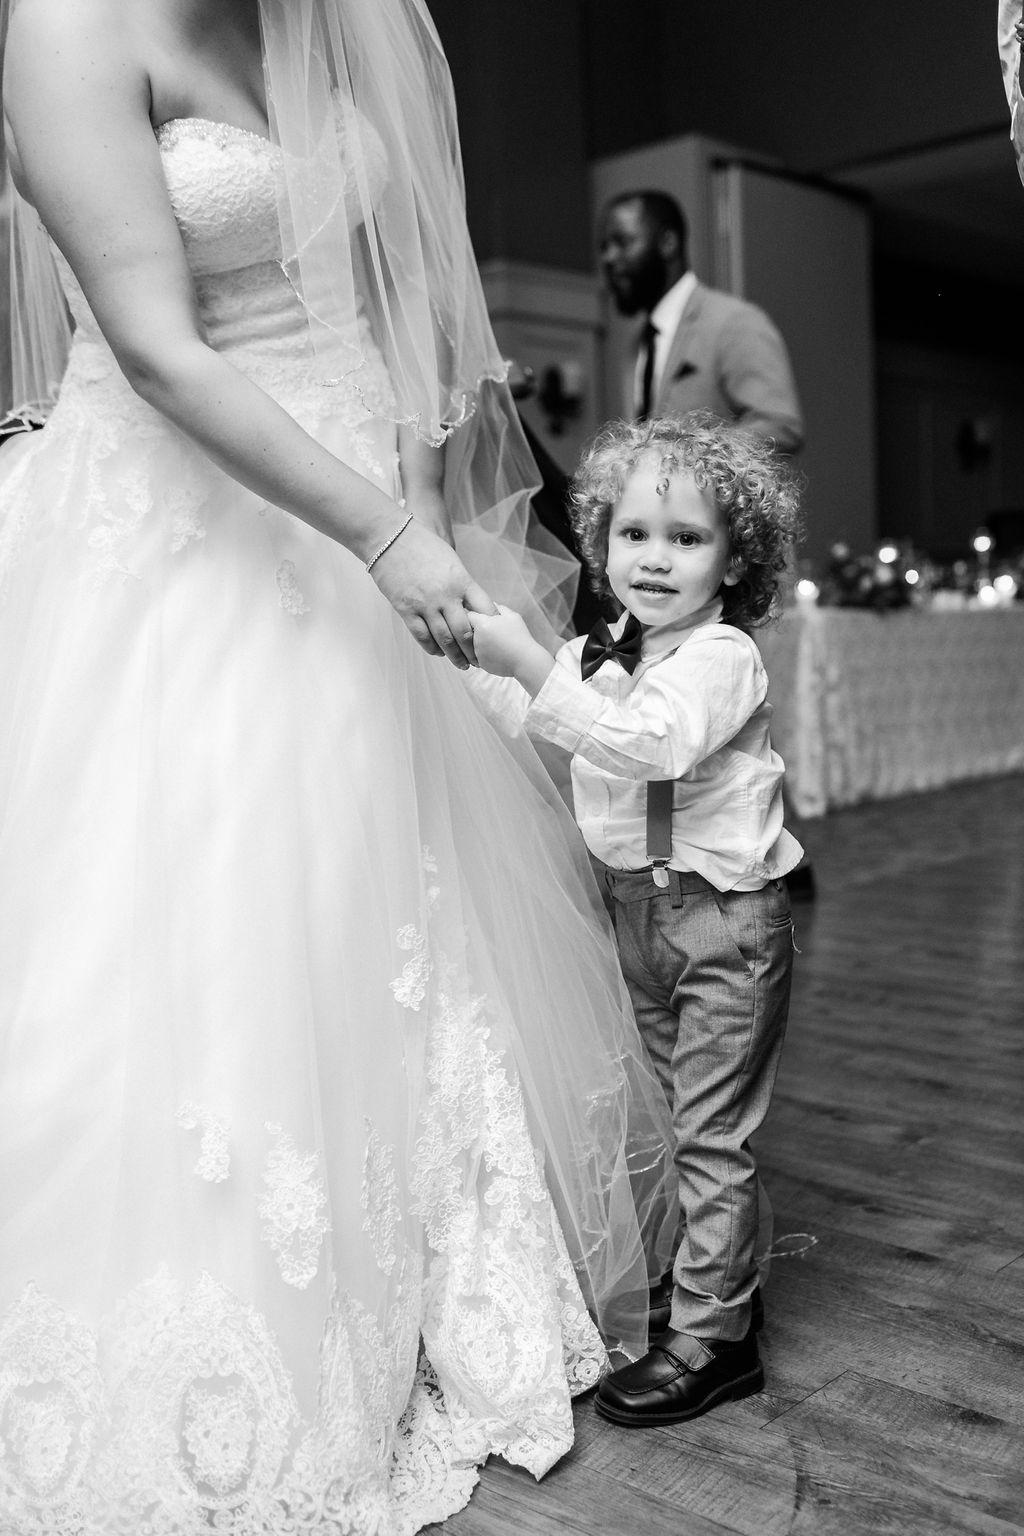 Mother-Son Wedding Photo // spunkysapphire.com/blog